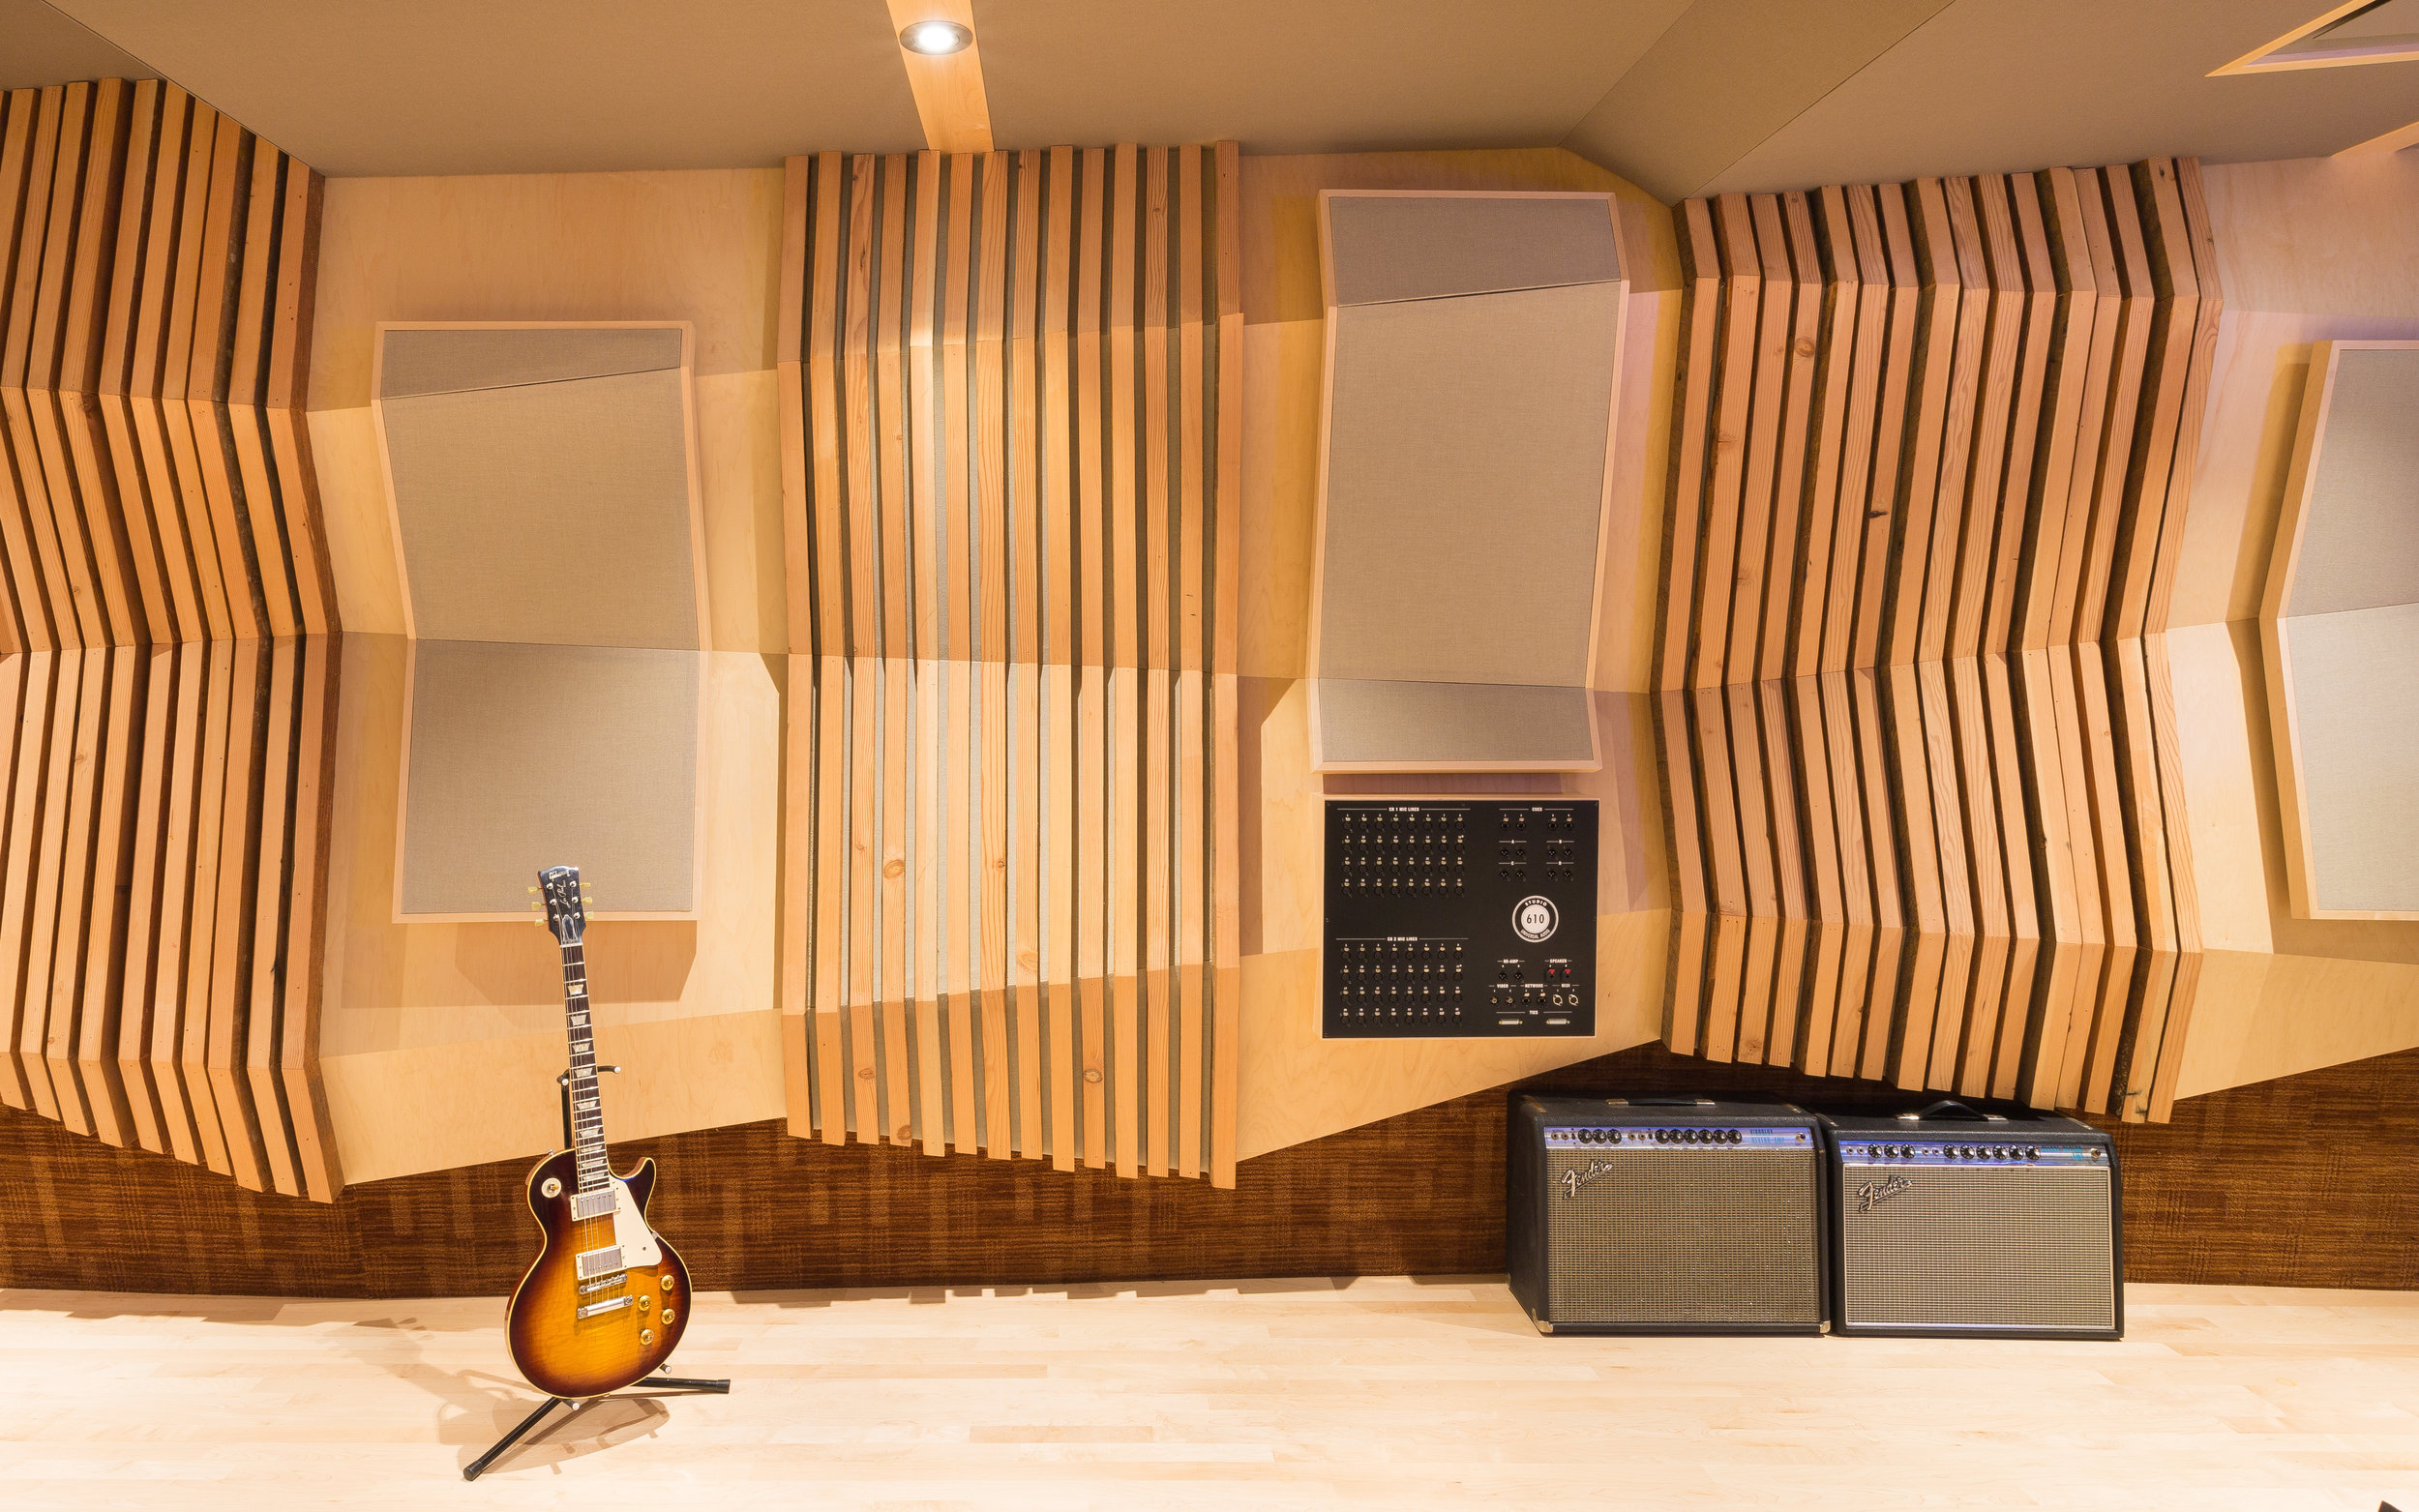 Universal Audio Studio Architectural Photography